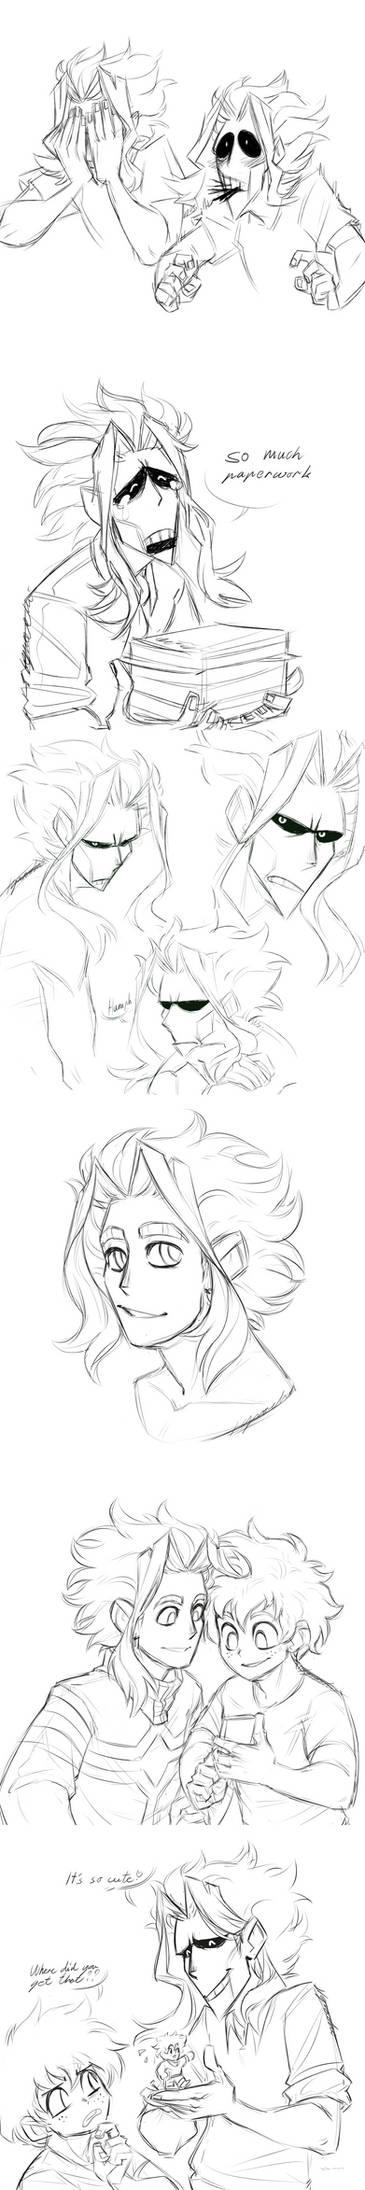 Toshinori Skethces Dump